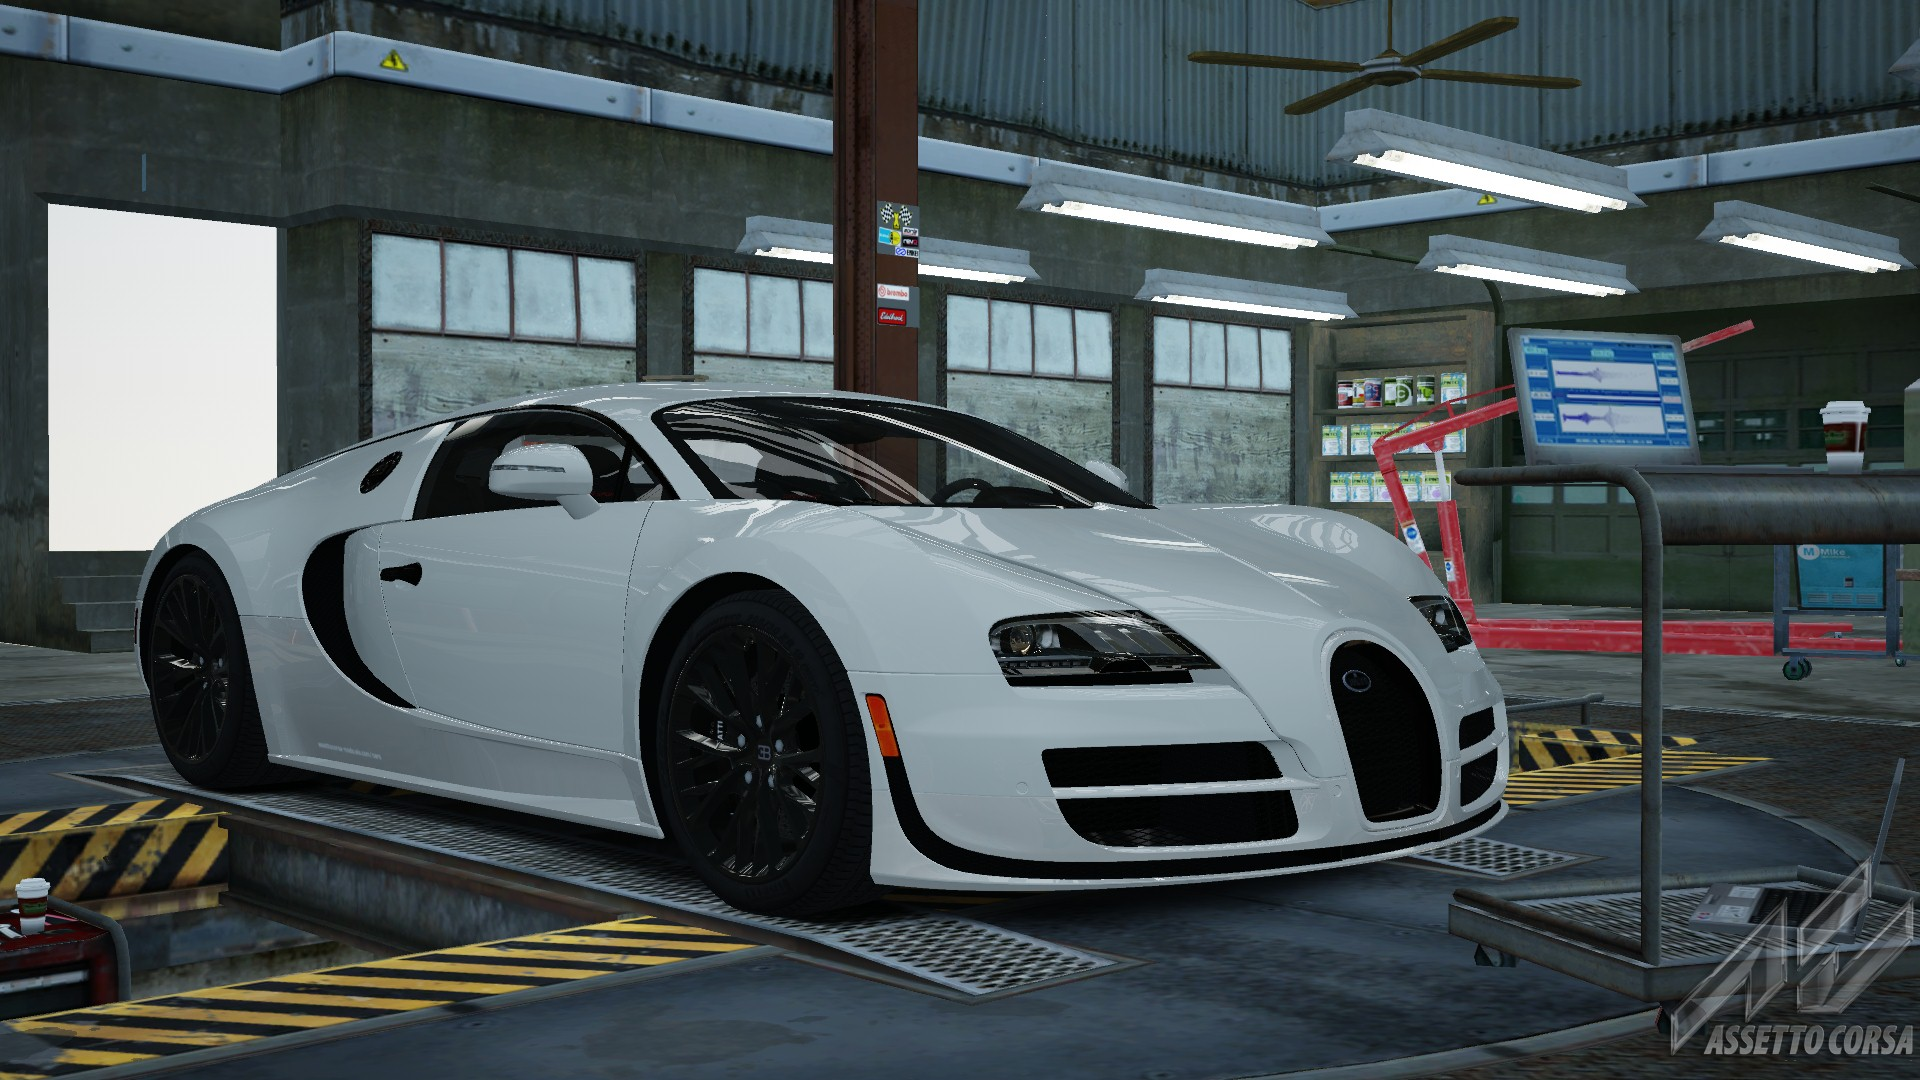 Bugatti Veyron Super Sport - Bugatti - Car Detail - Assetto Corsa ...